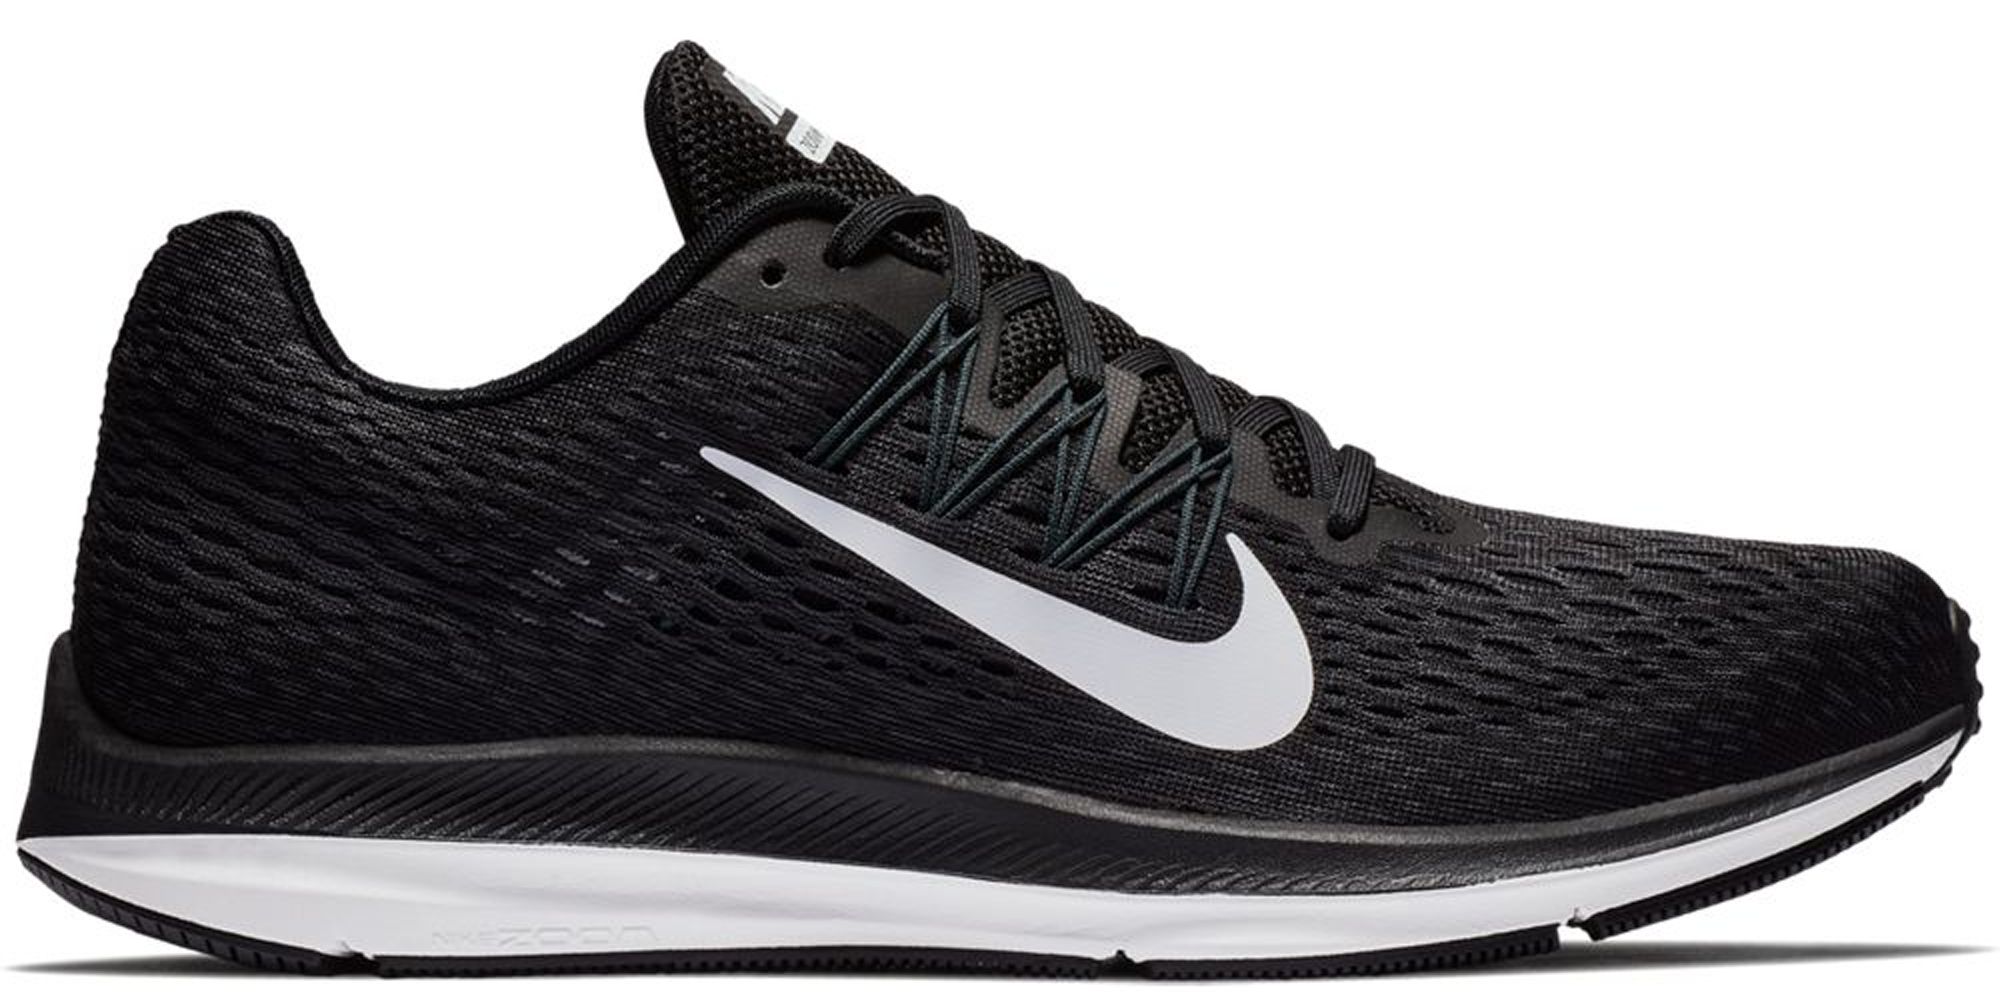 Nike Air Zoom Winflo 5 Black White